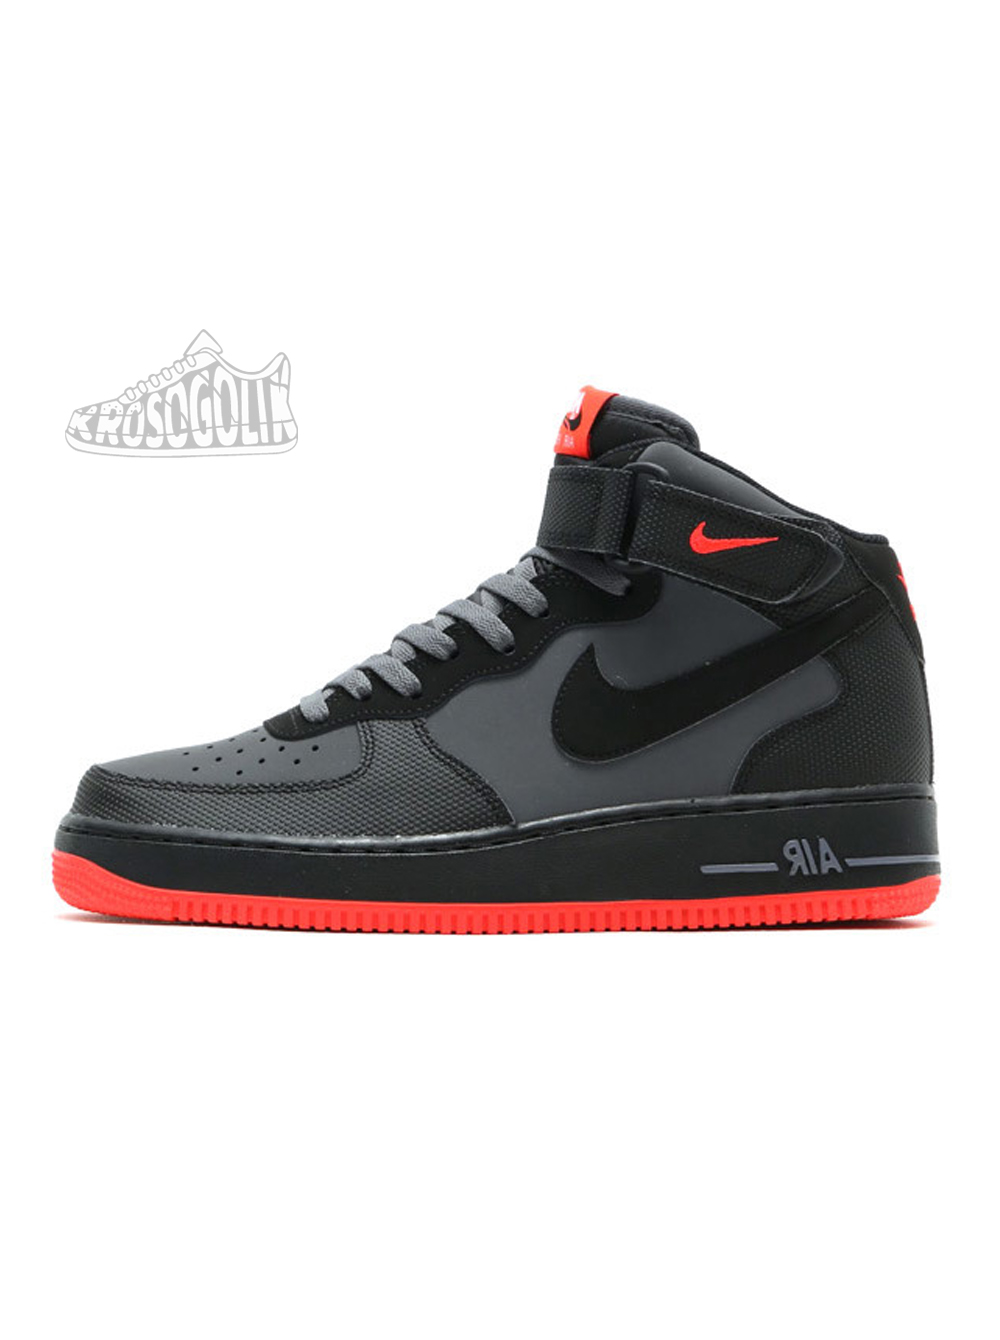 a16ad31c Купить мужские кроссовки Nike Air Force 1 Mid на krosogolik.com